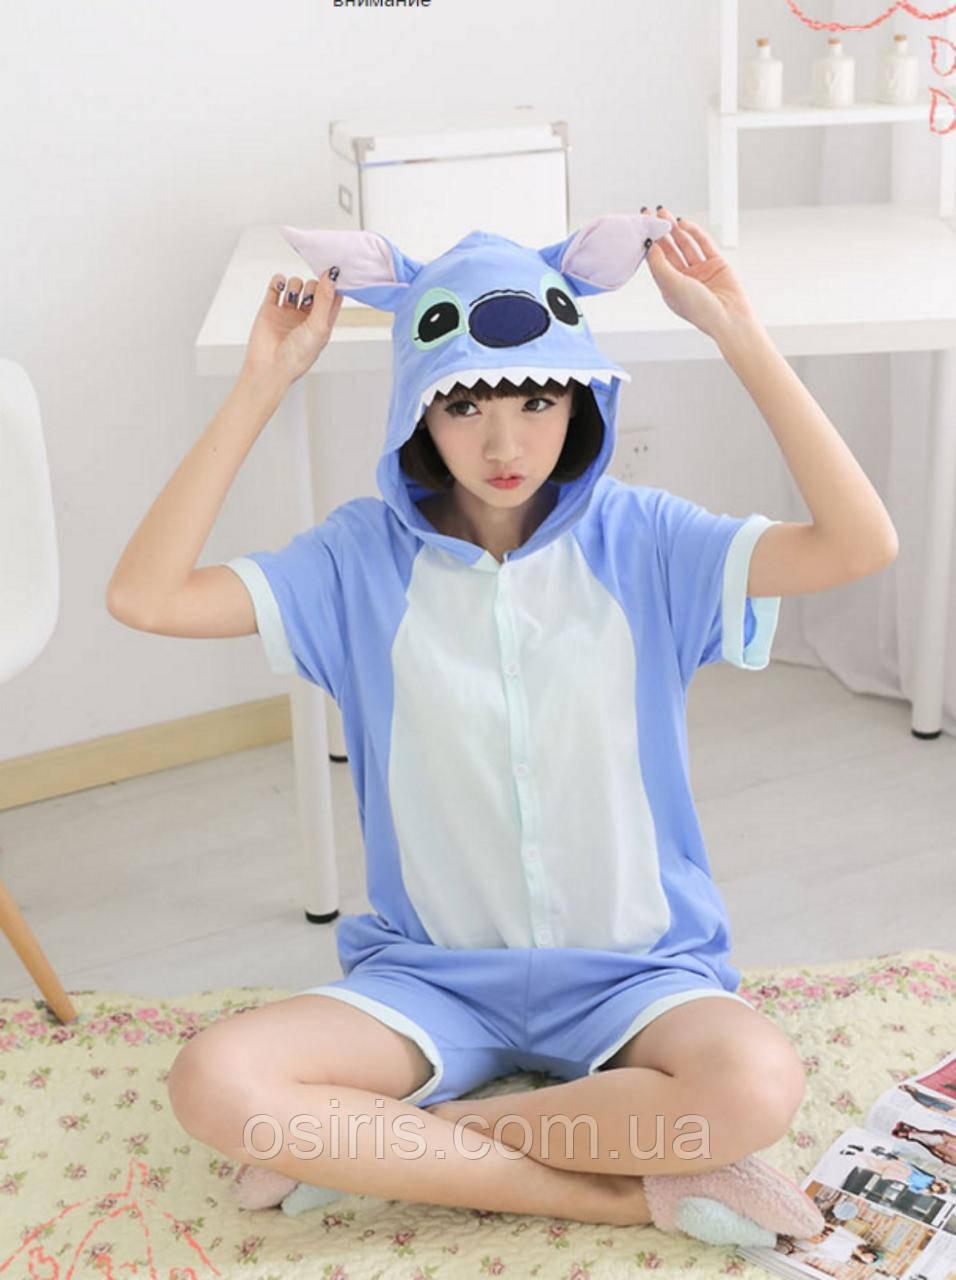 Пижама Кигуруми Стич летняя хлопок размер L на рост 165-175 см